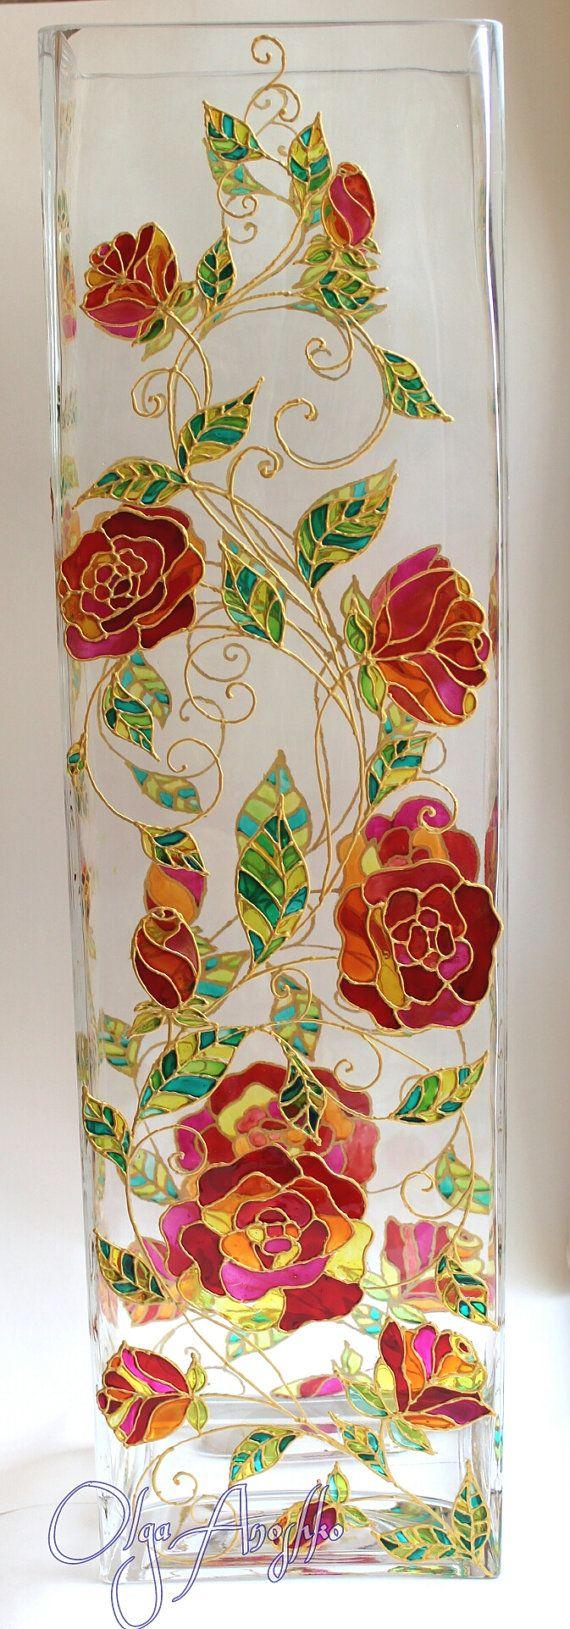 Red Flowers Vase Stained Glass Modern Vase от RomanticArtGlass